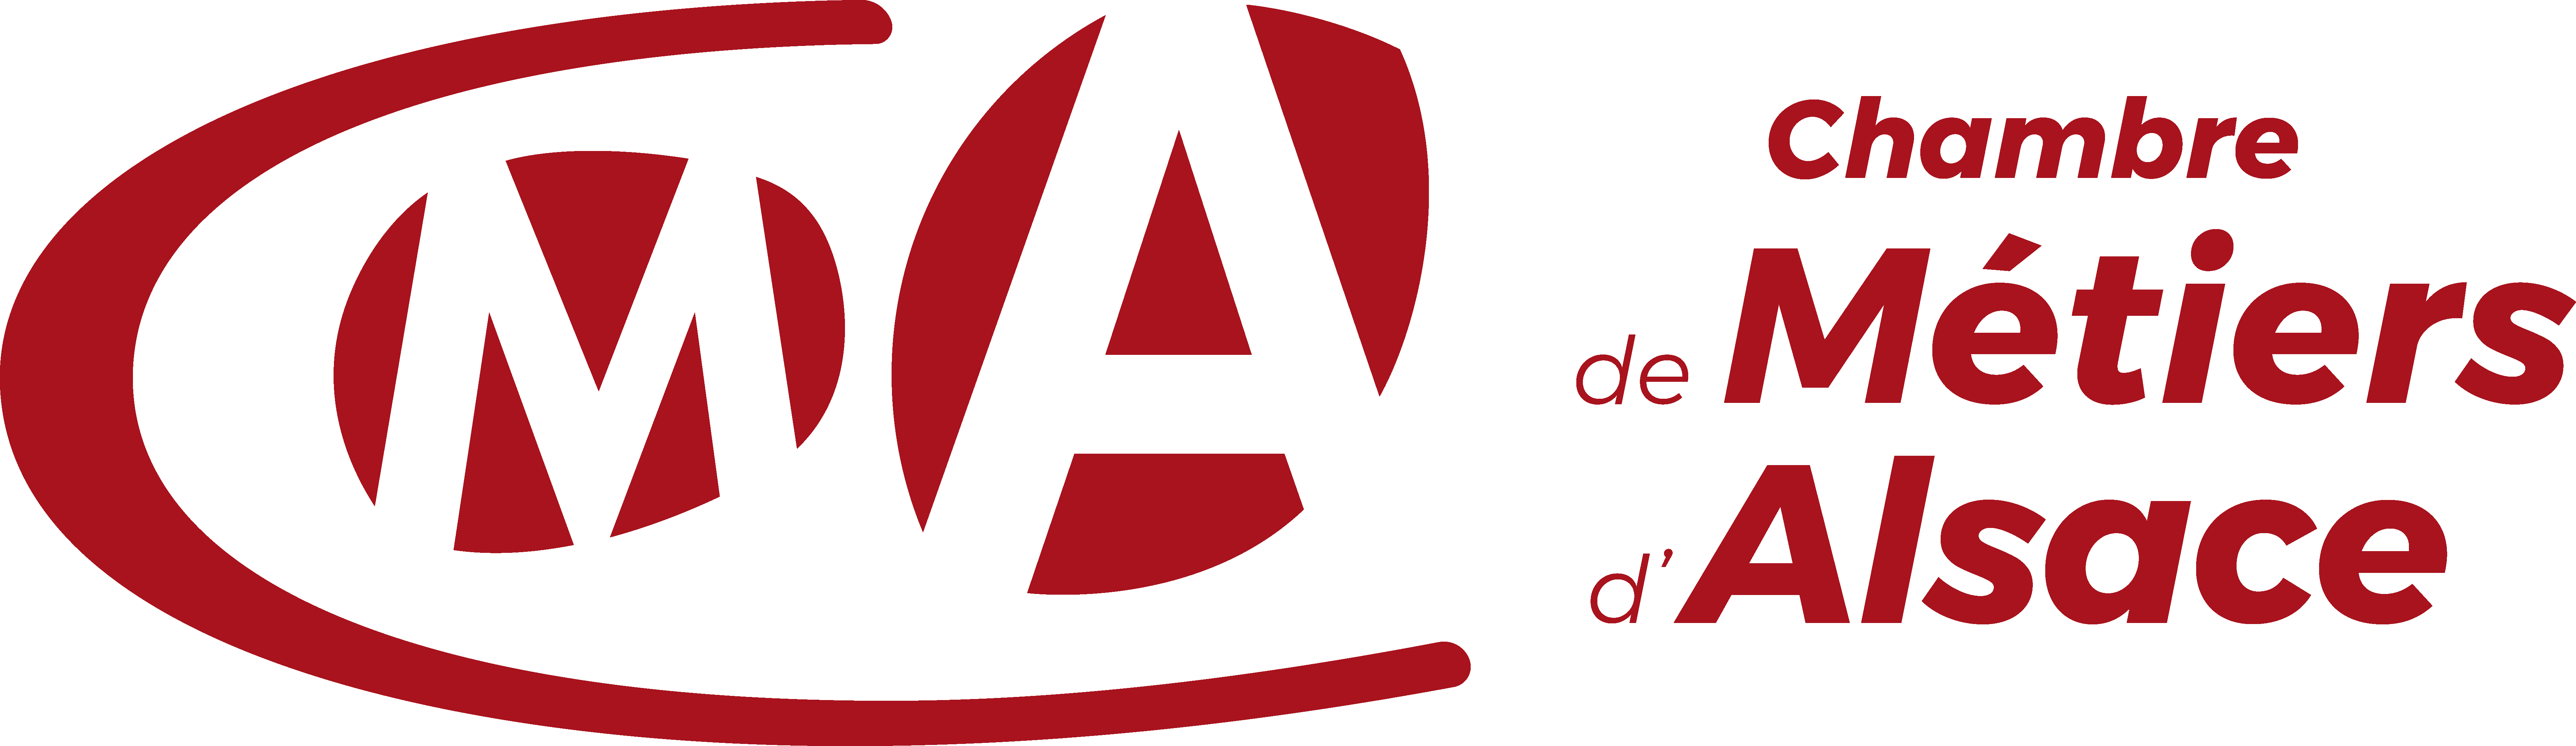 Action industrie collaborative aic campus industrie - Chambre des metiers cote d or ...